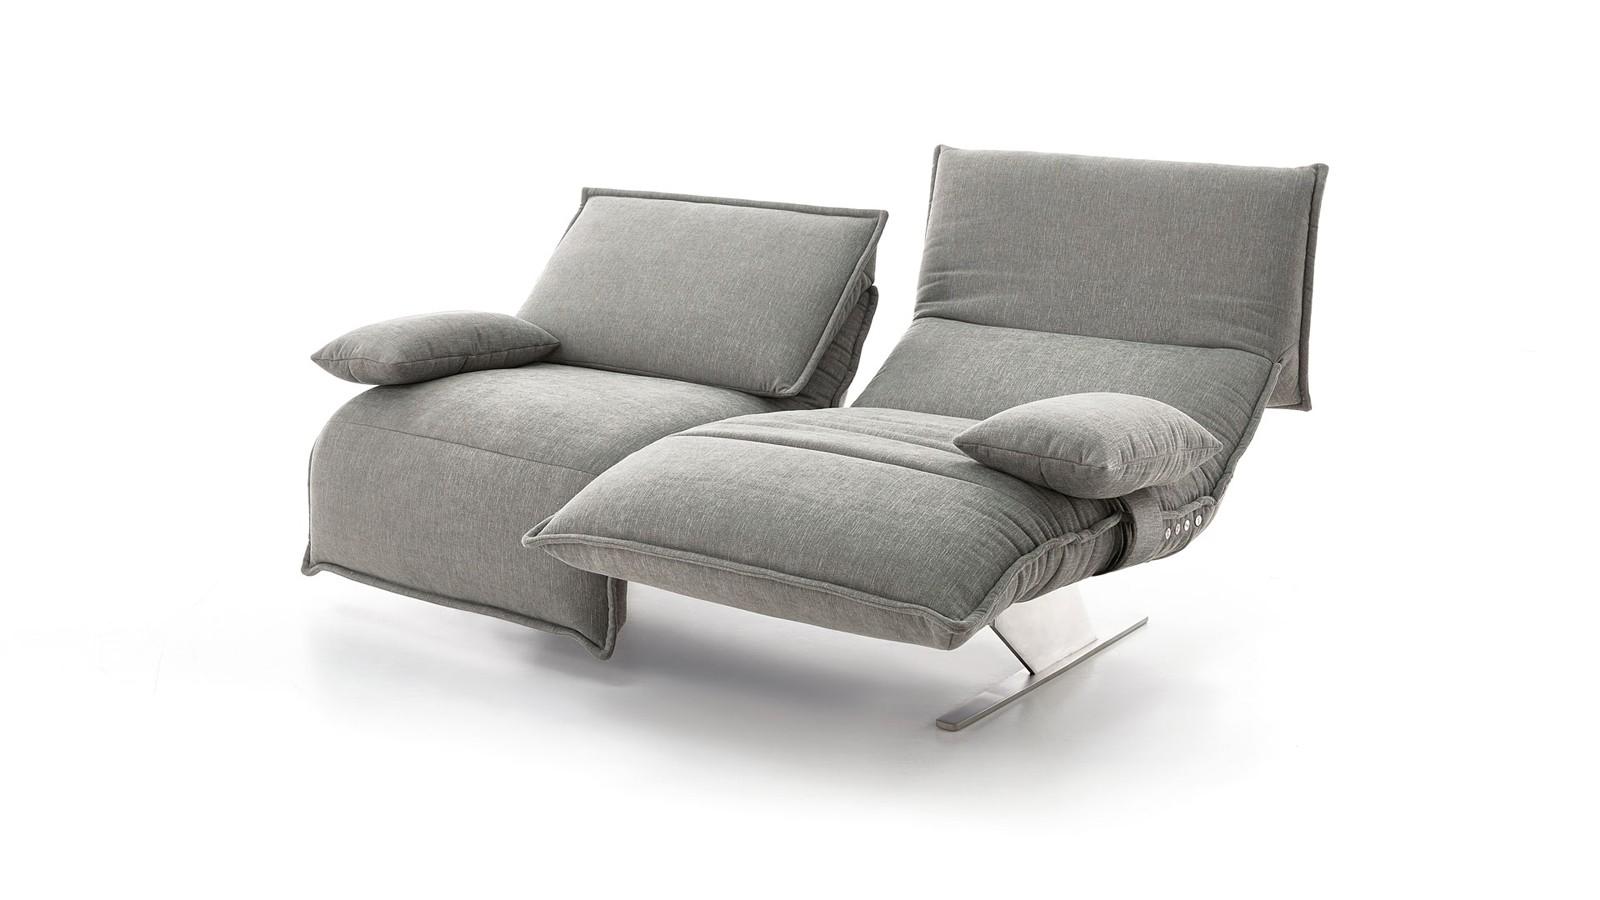 Canapea modernă Koinor Evia - Free motion